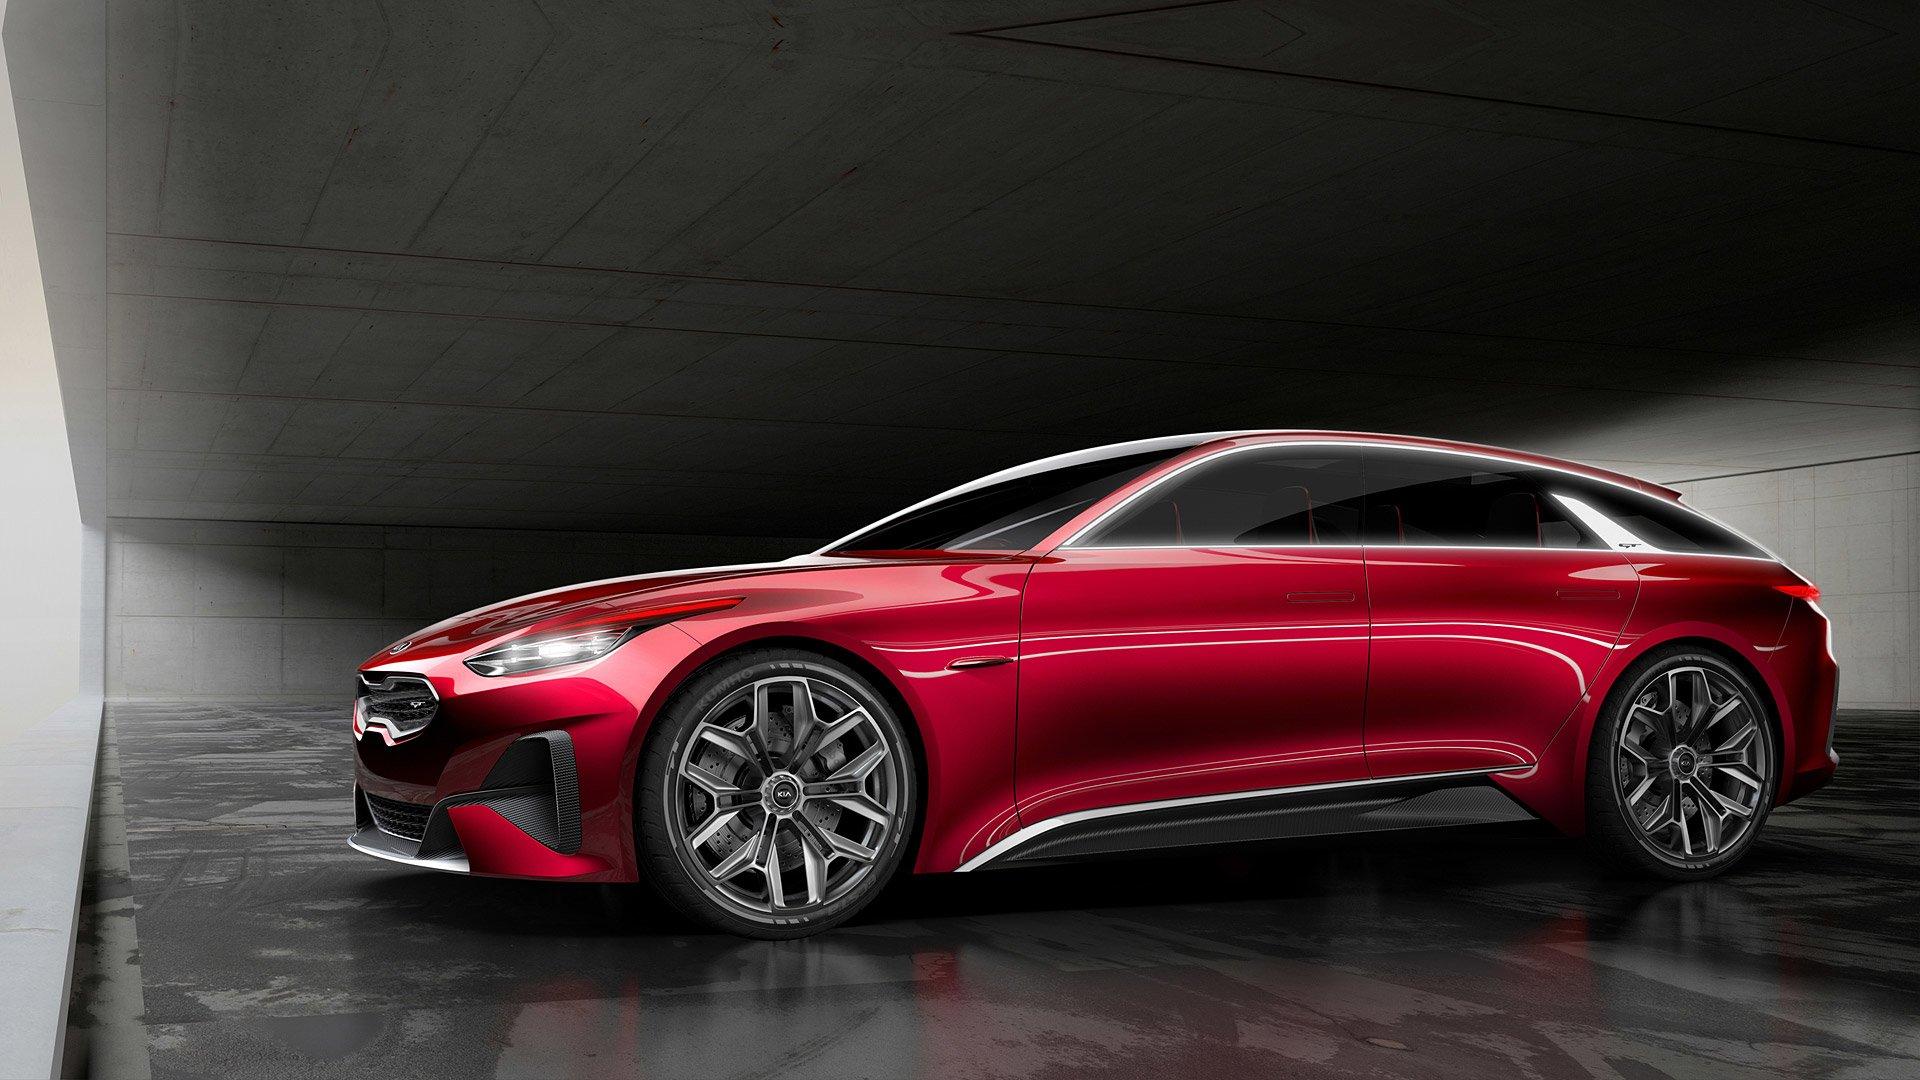 2017 Kia Proceed Concept Hd обои фон 1920x1080 Id